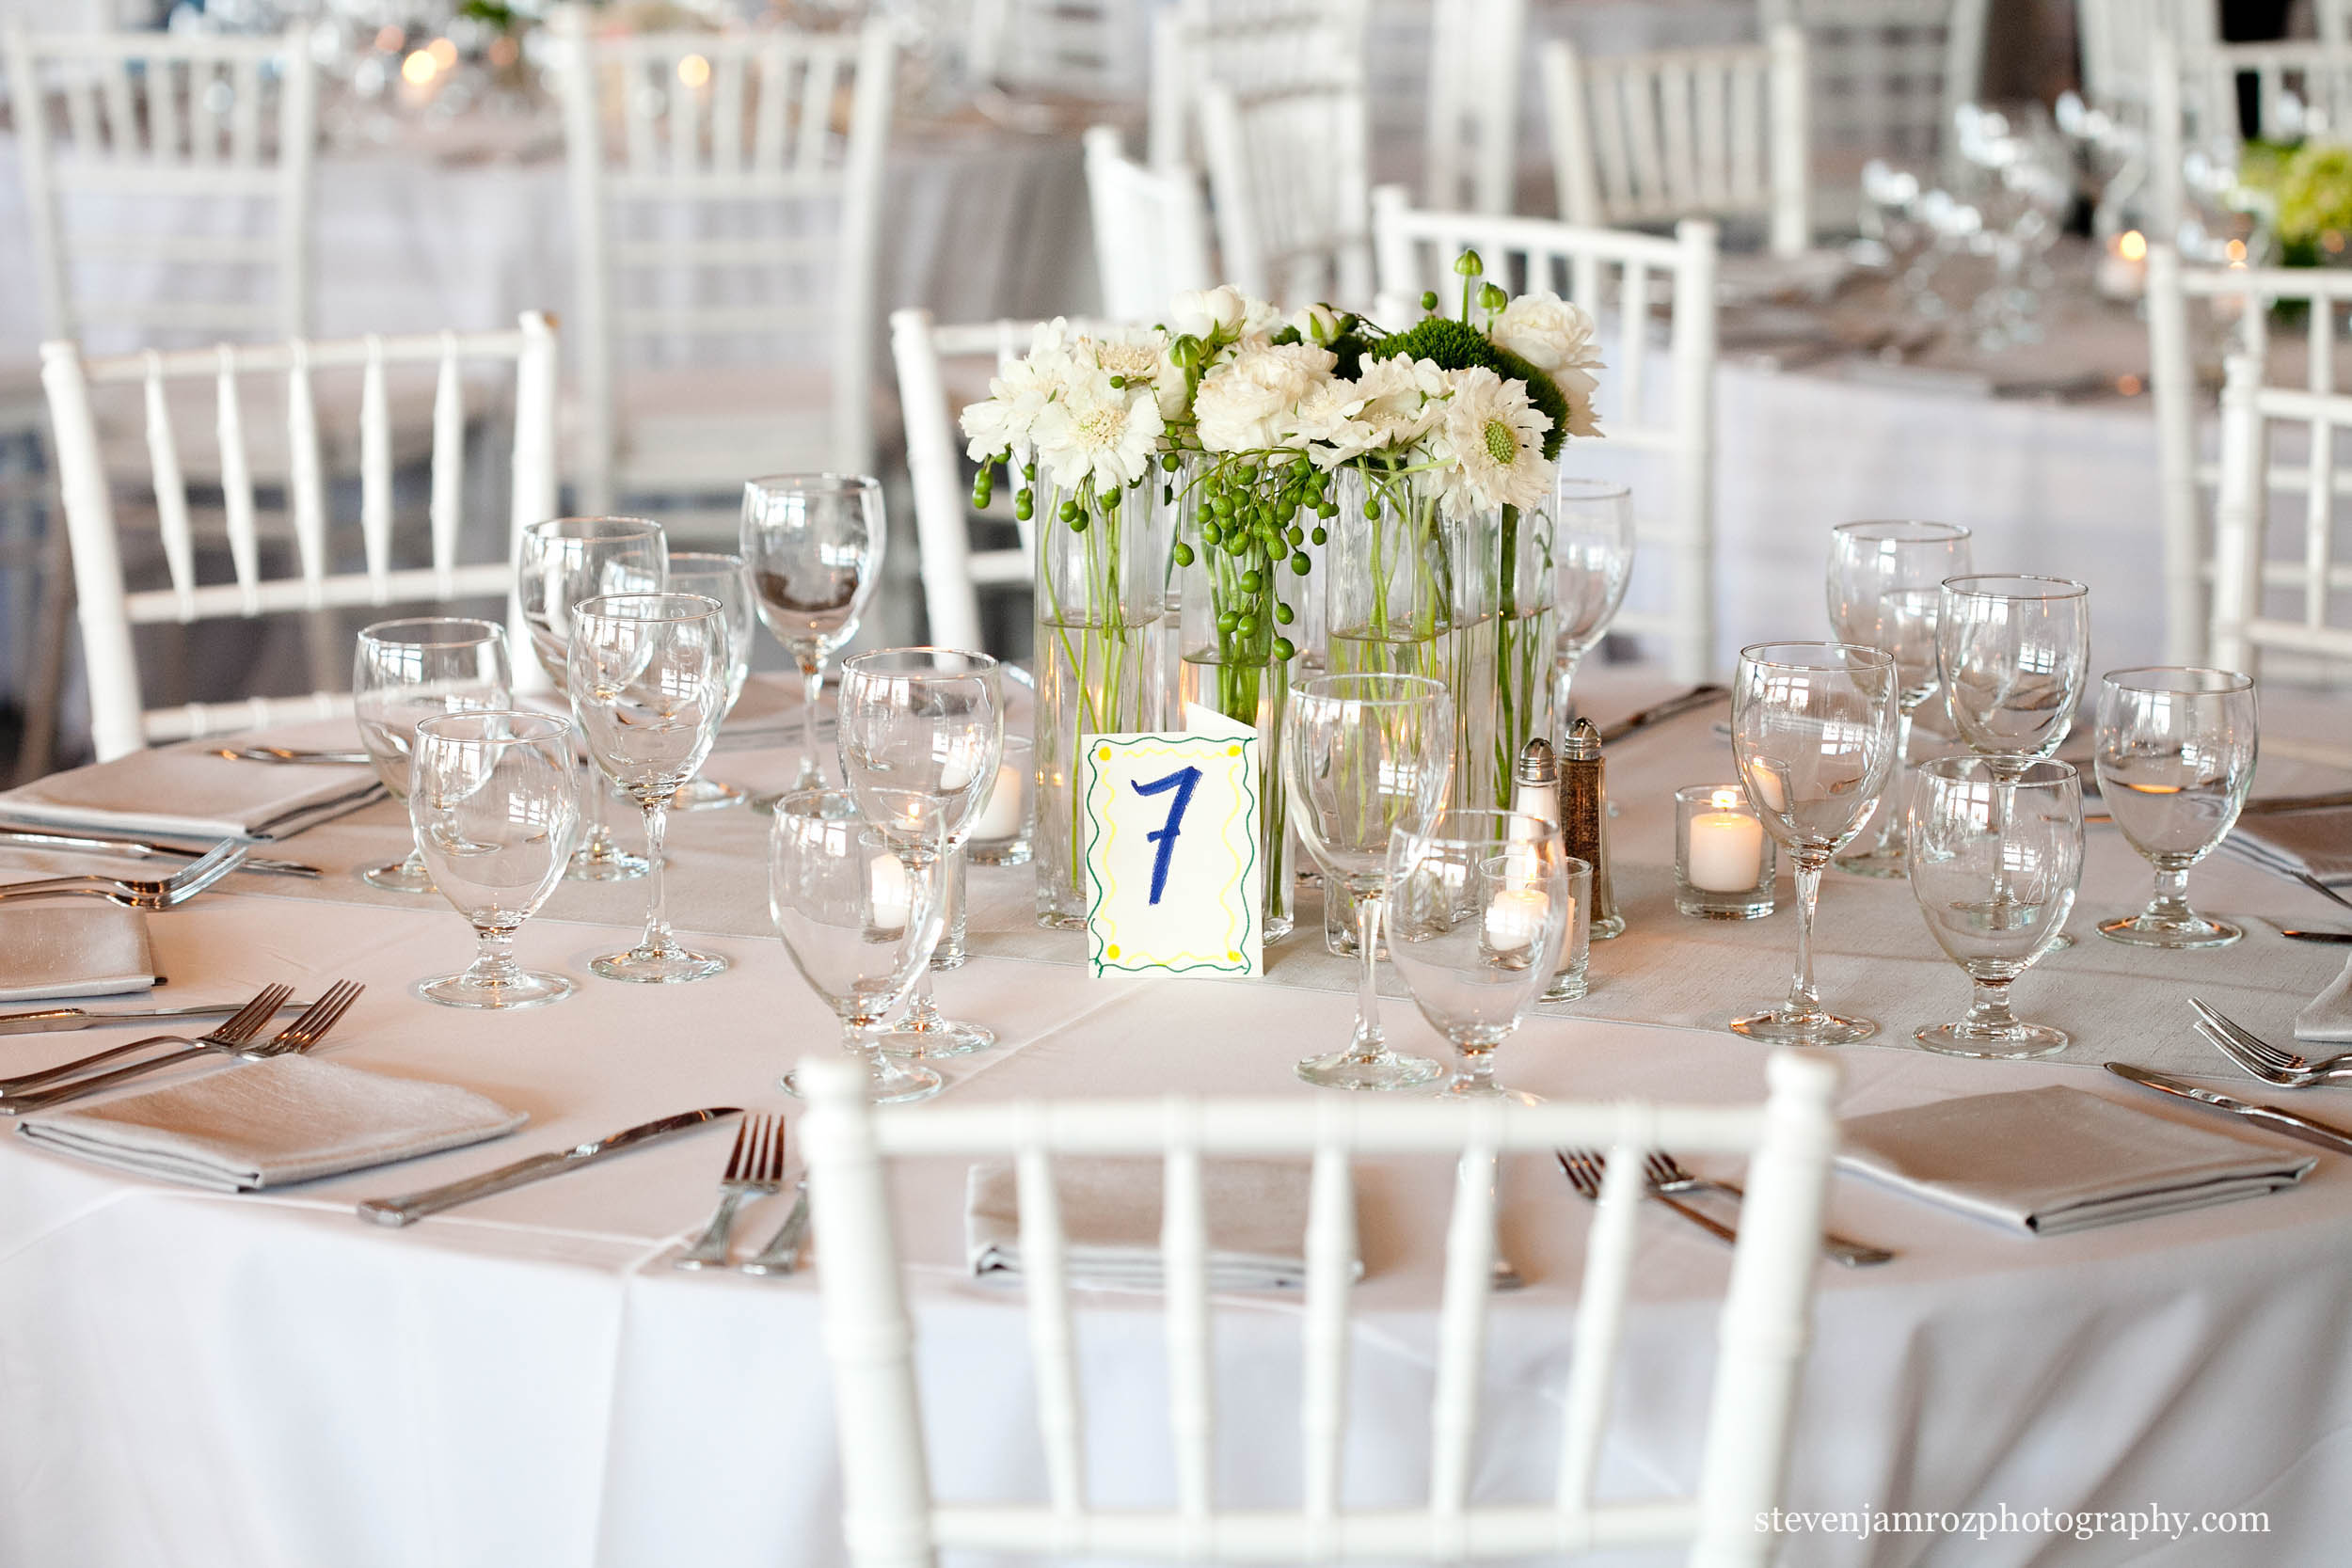 highgrove-estate-nc-wedding-steven-jamroz-photography-0602.jpg